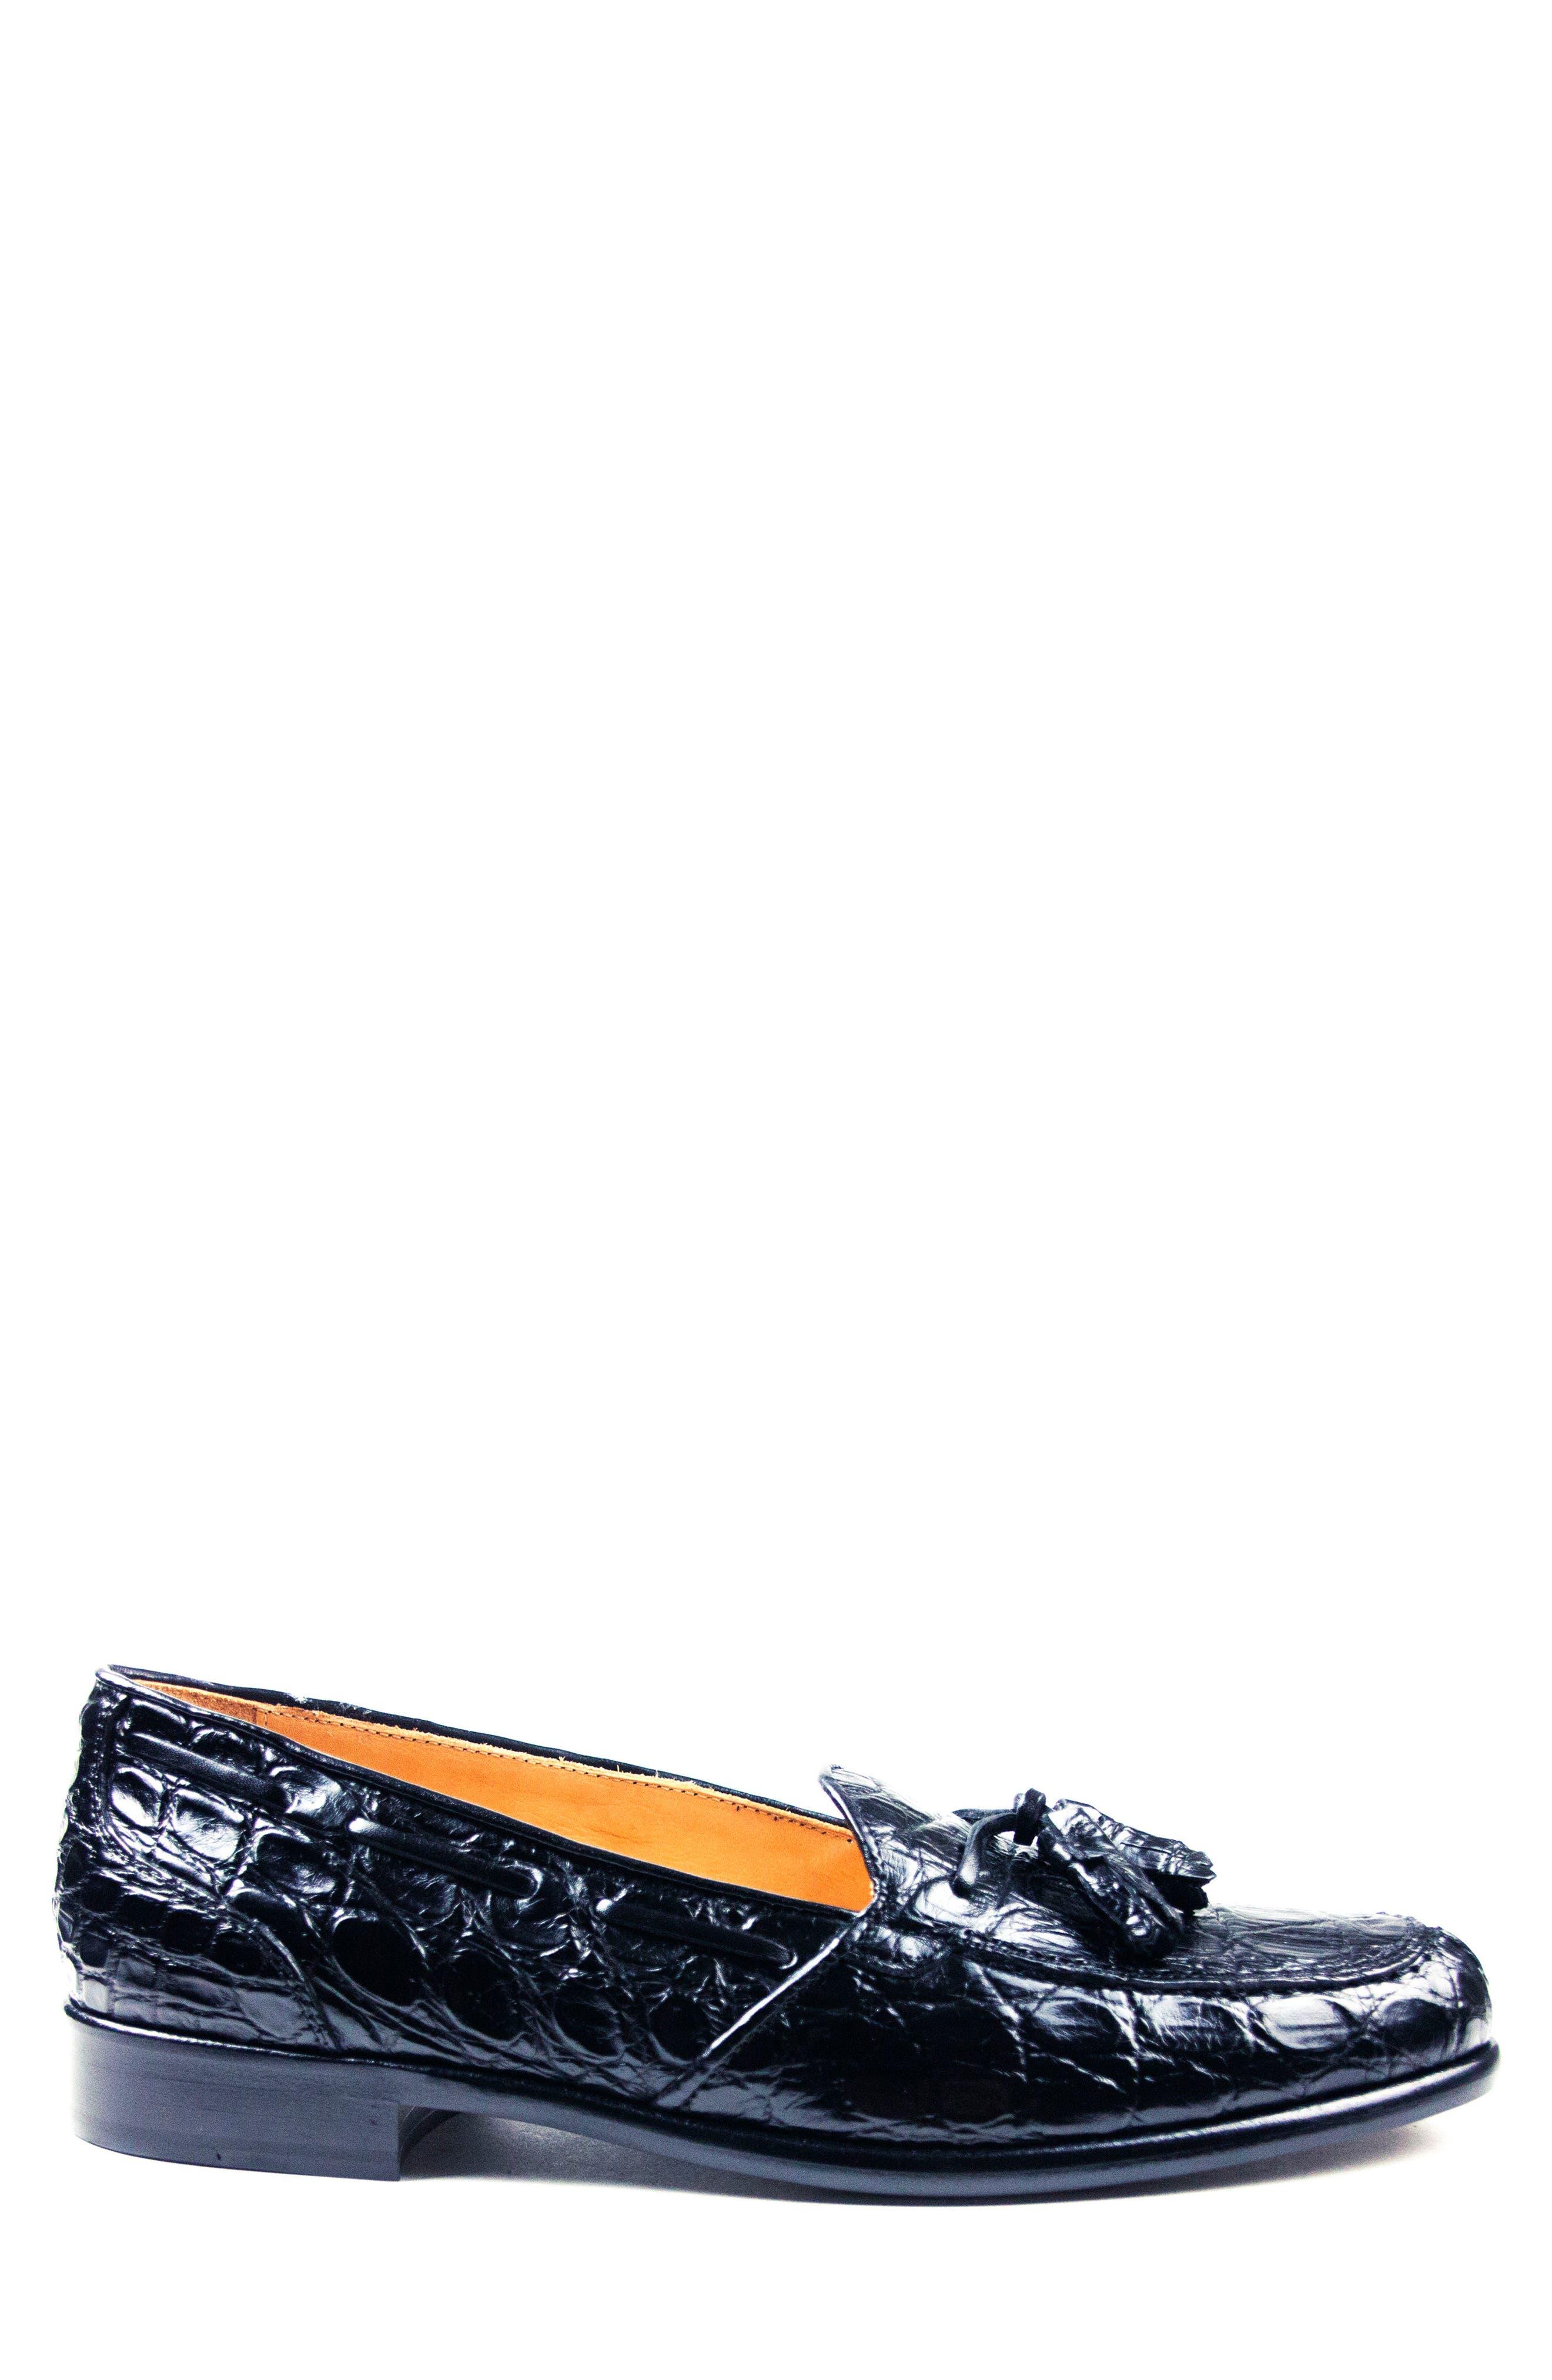 Franco Tassel Exotic Leather Loafer,                             Alternate thumbnail 3, color,                             001